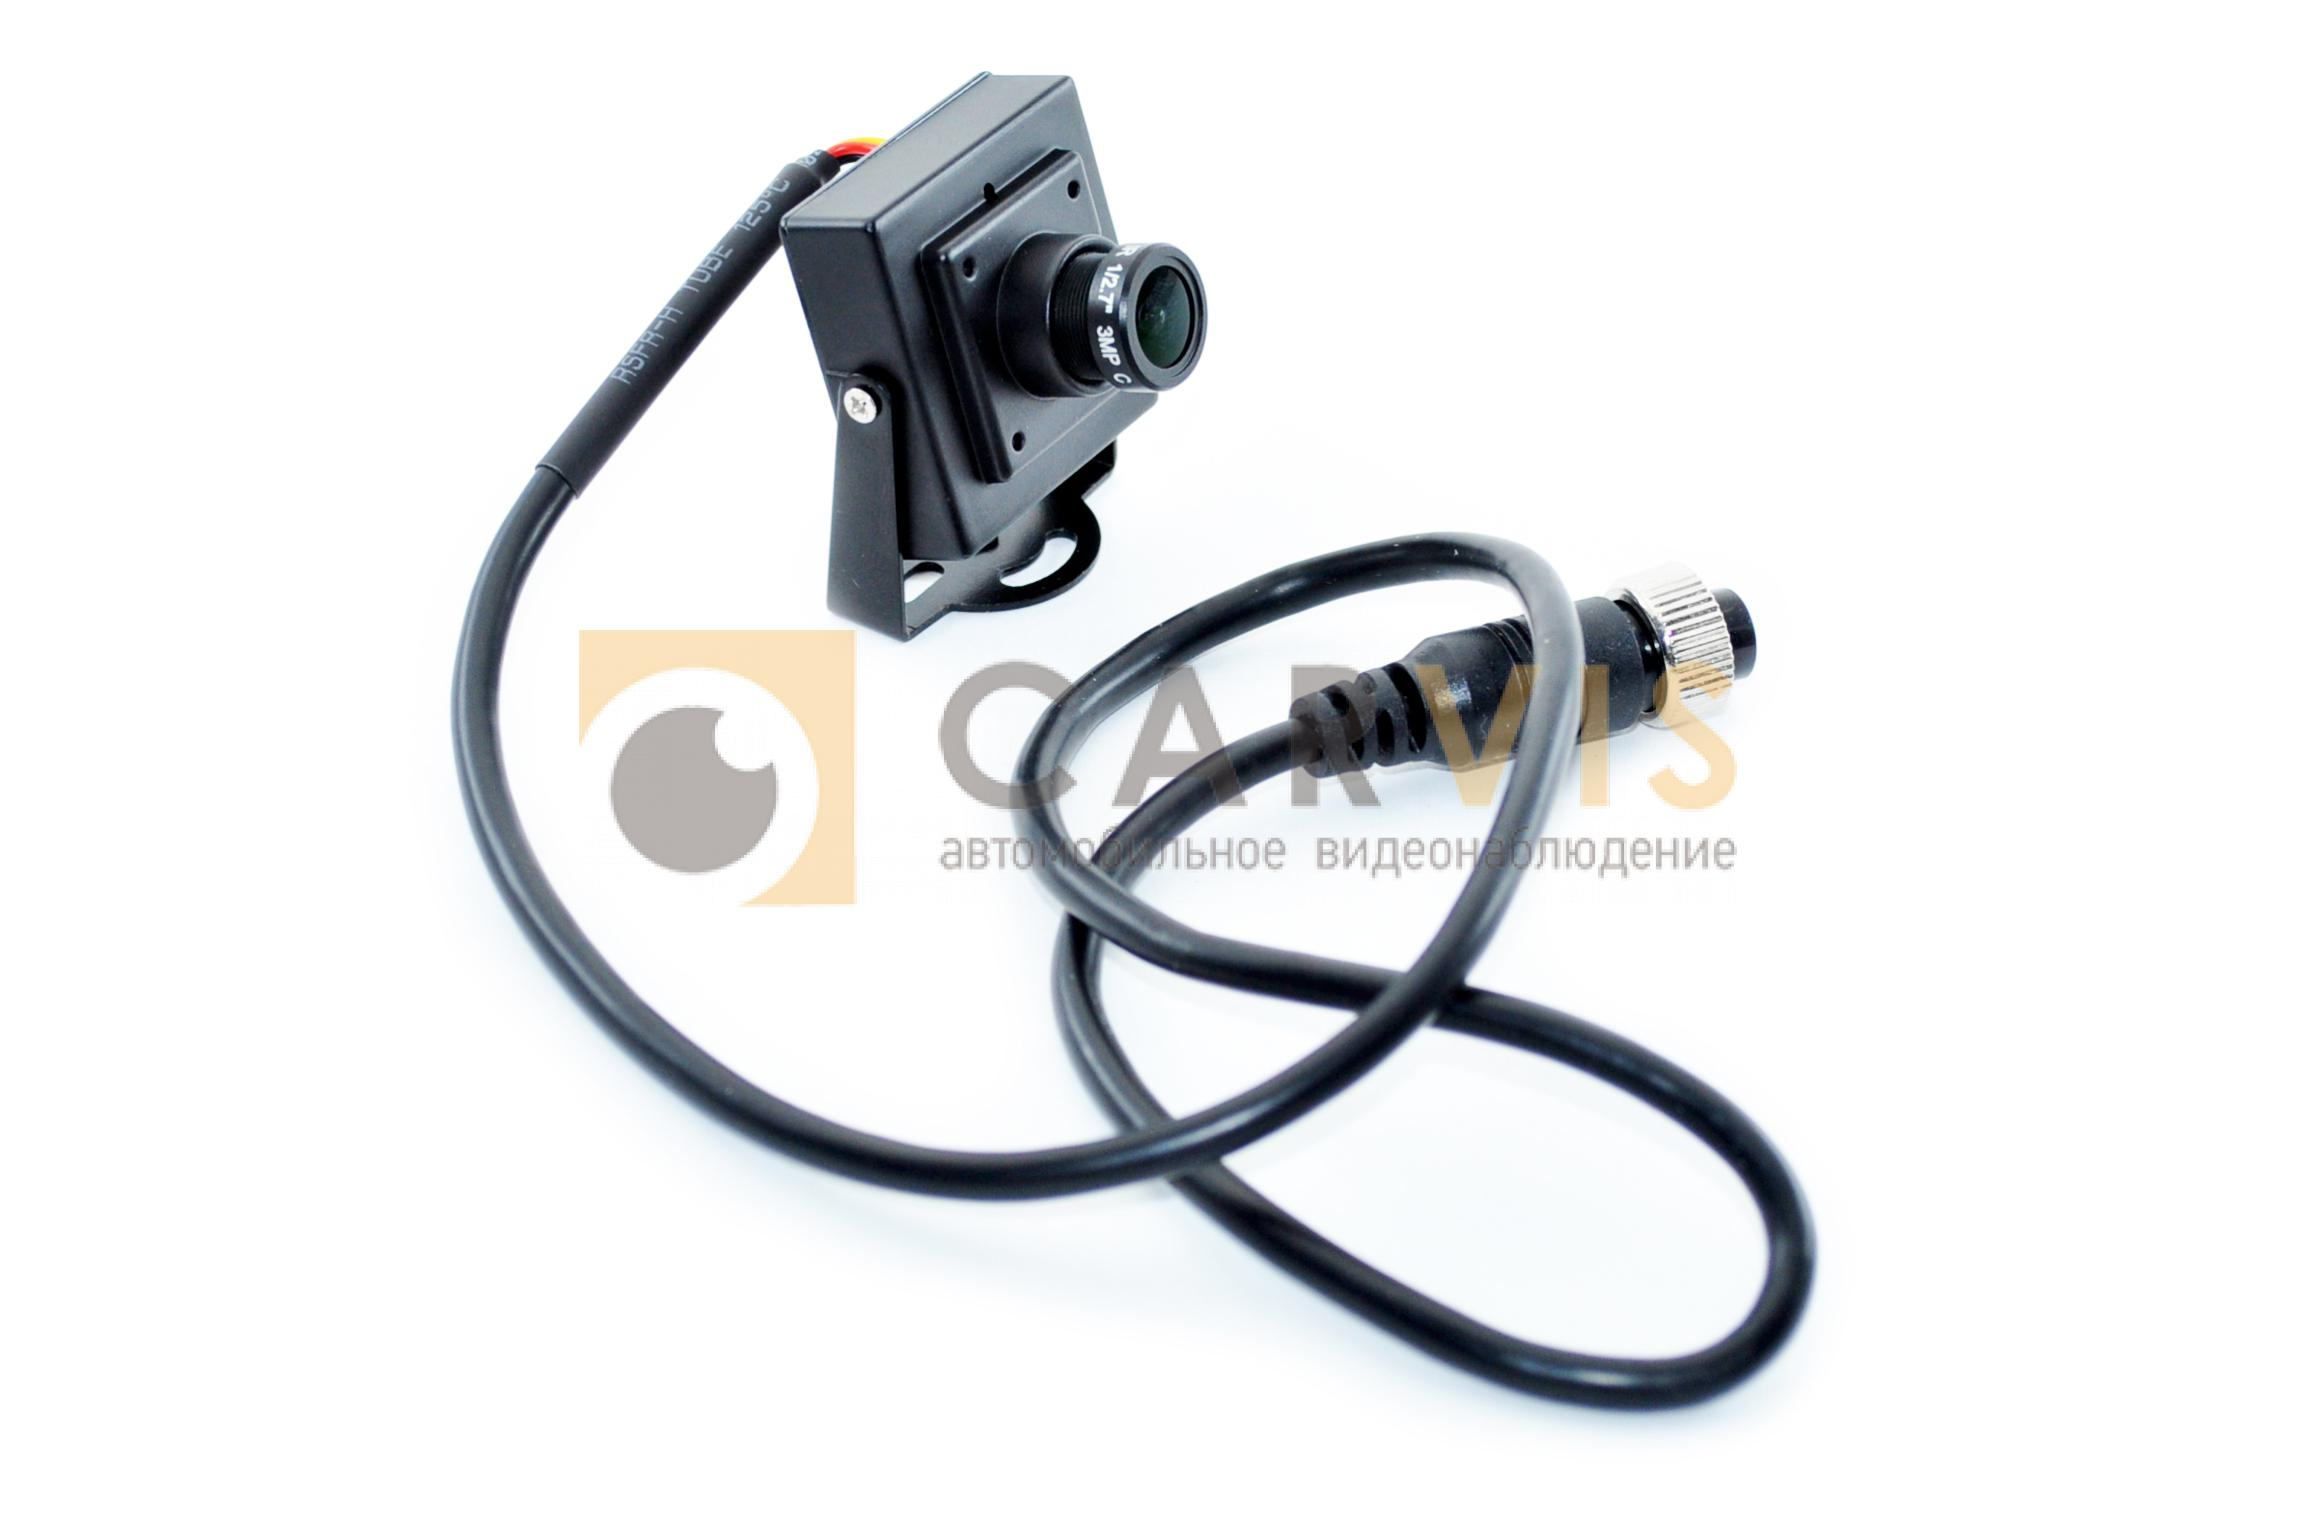 Камера Carvis MC-423 фото 2